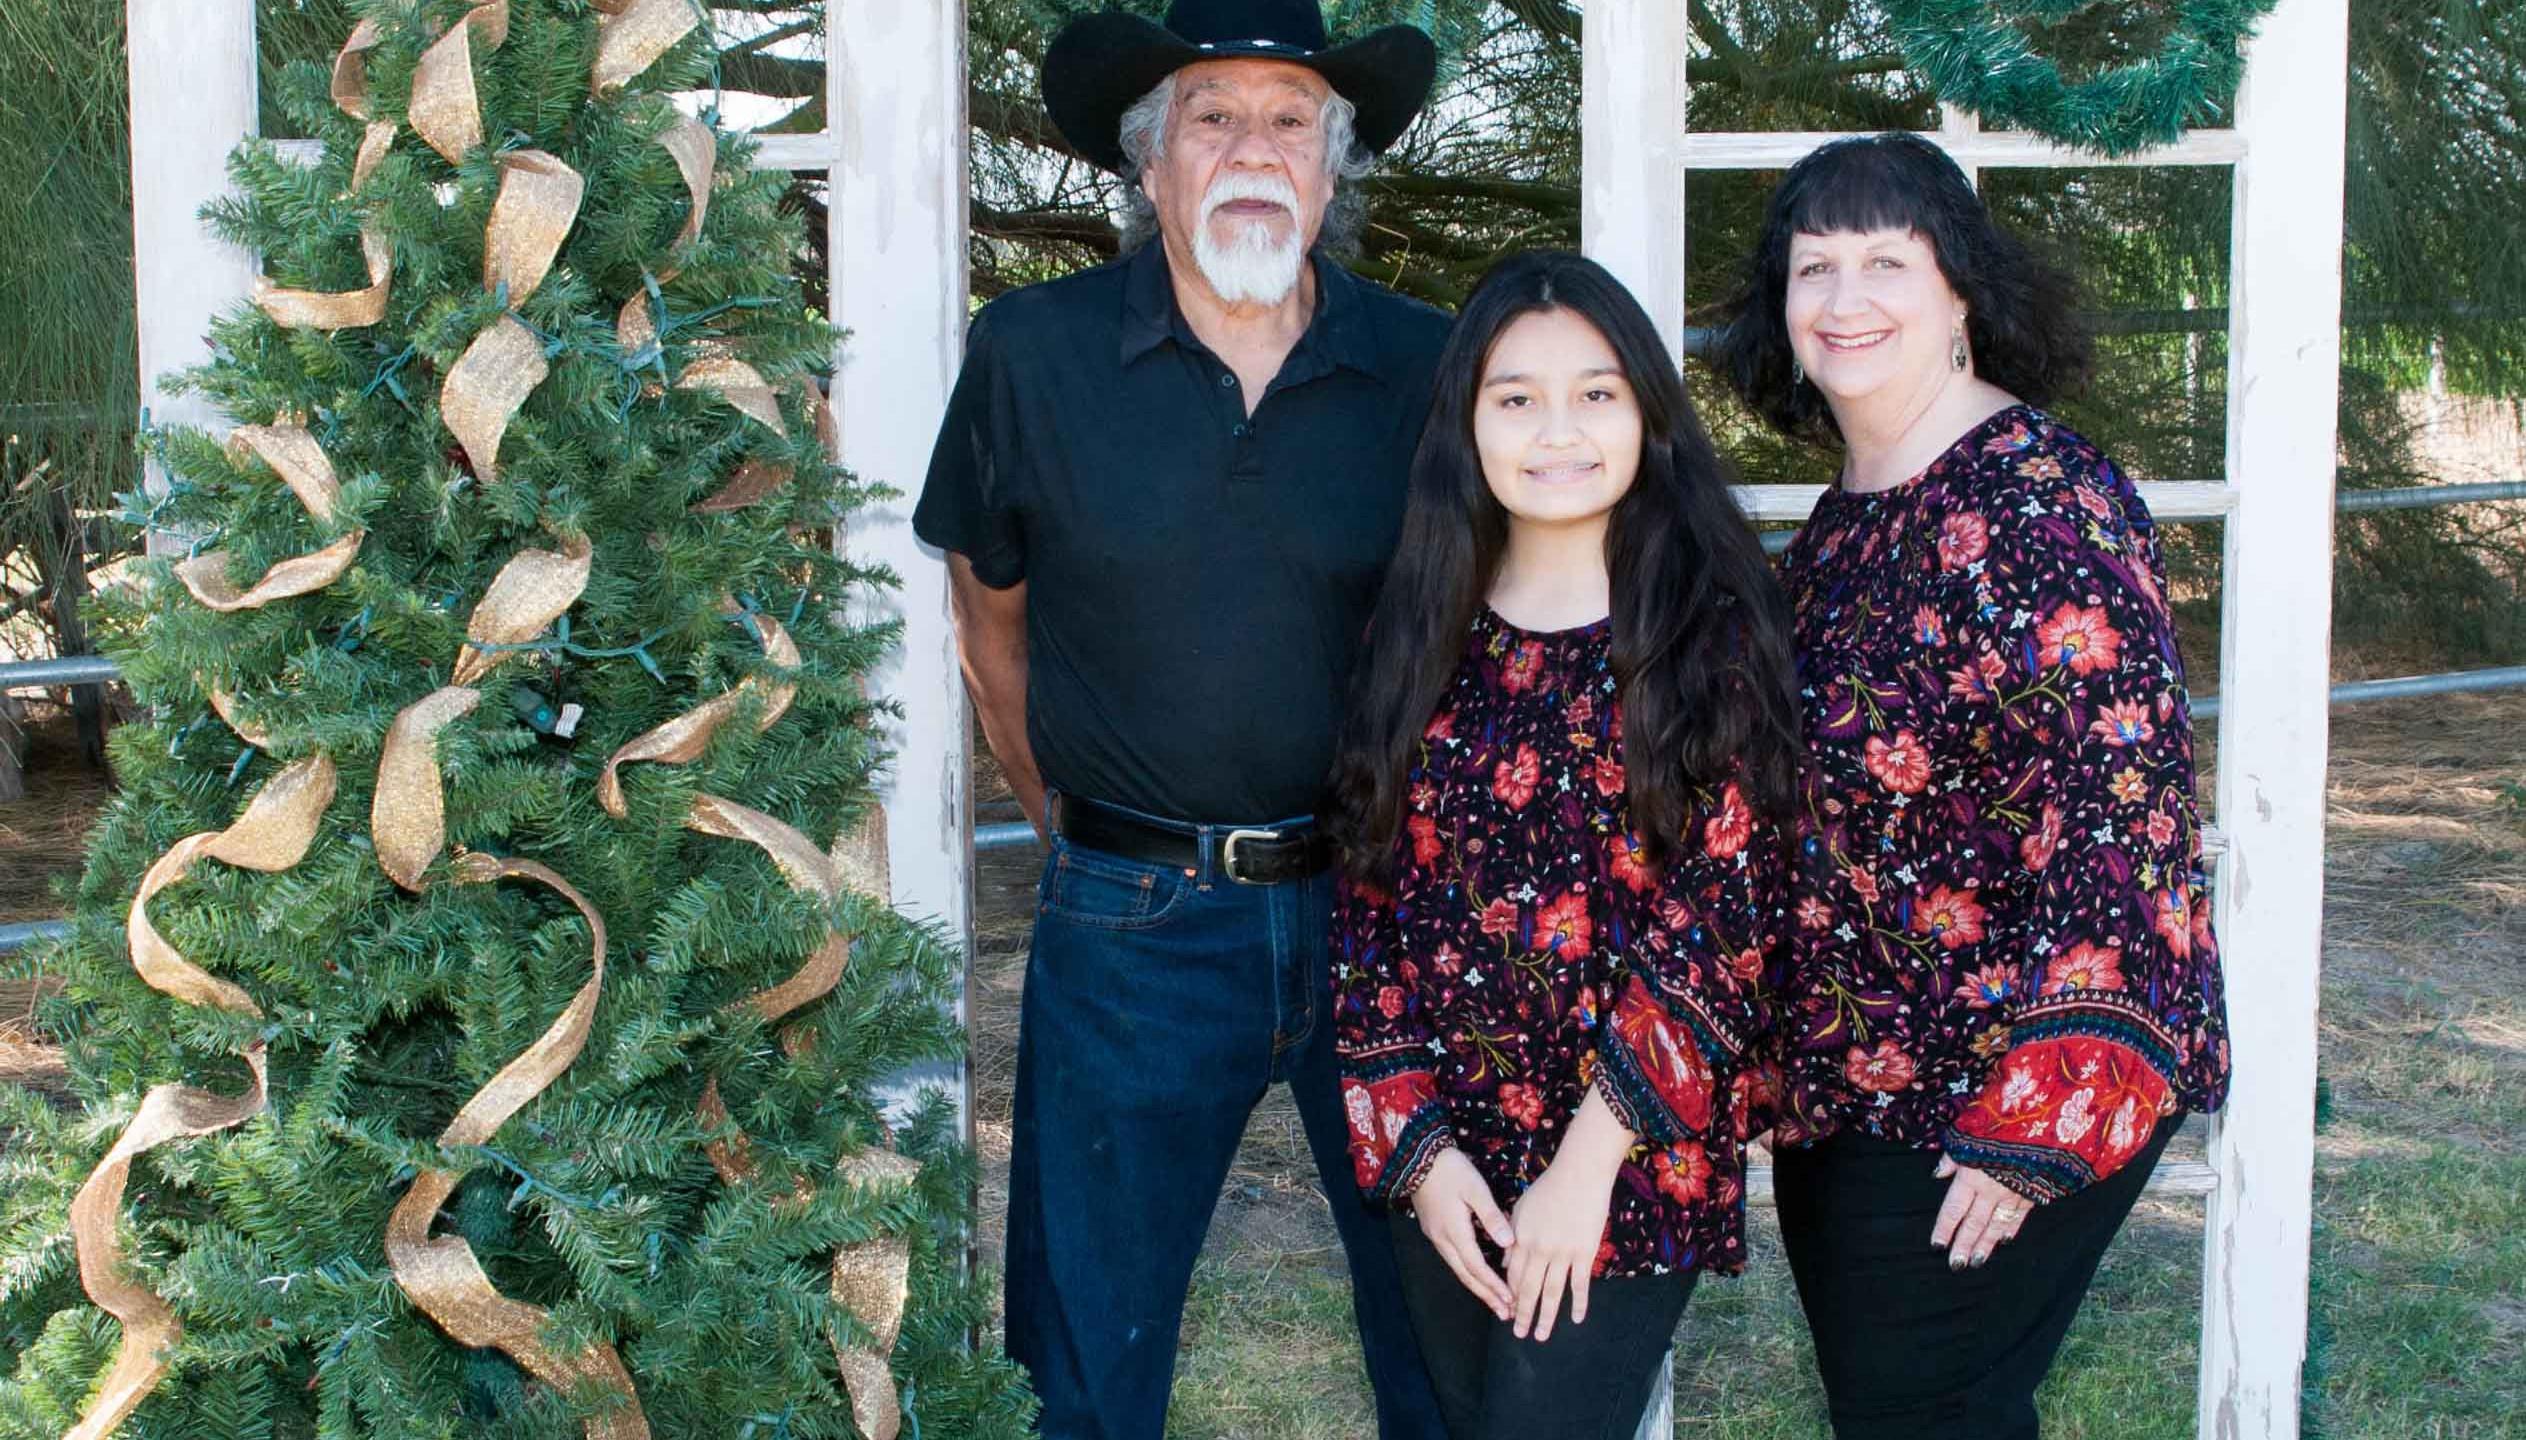 holiday christmas photos, outdoors family christmas pictures, on-site photography, buckeye, goodyear, az